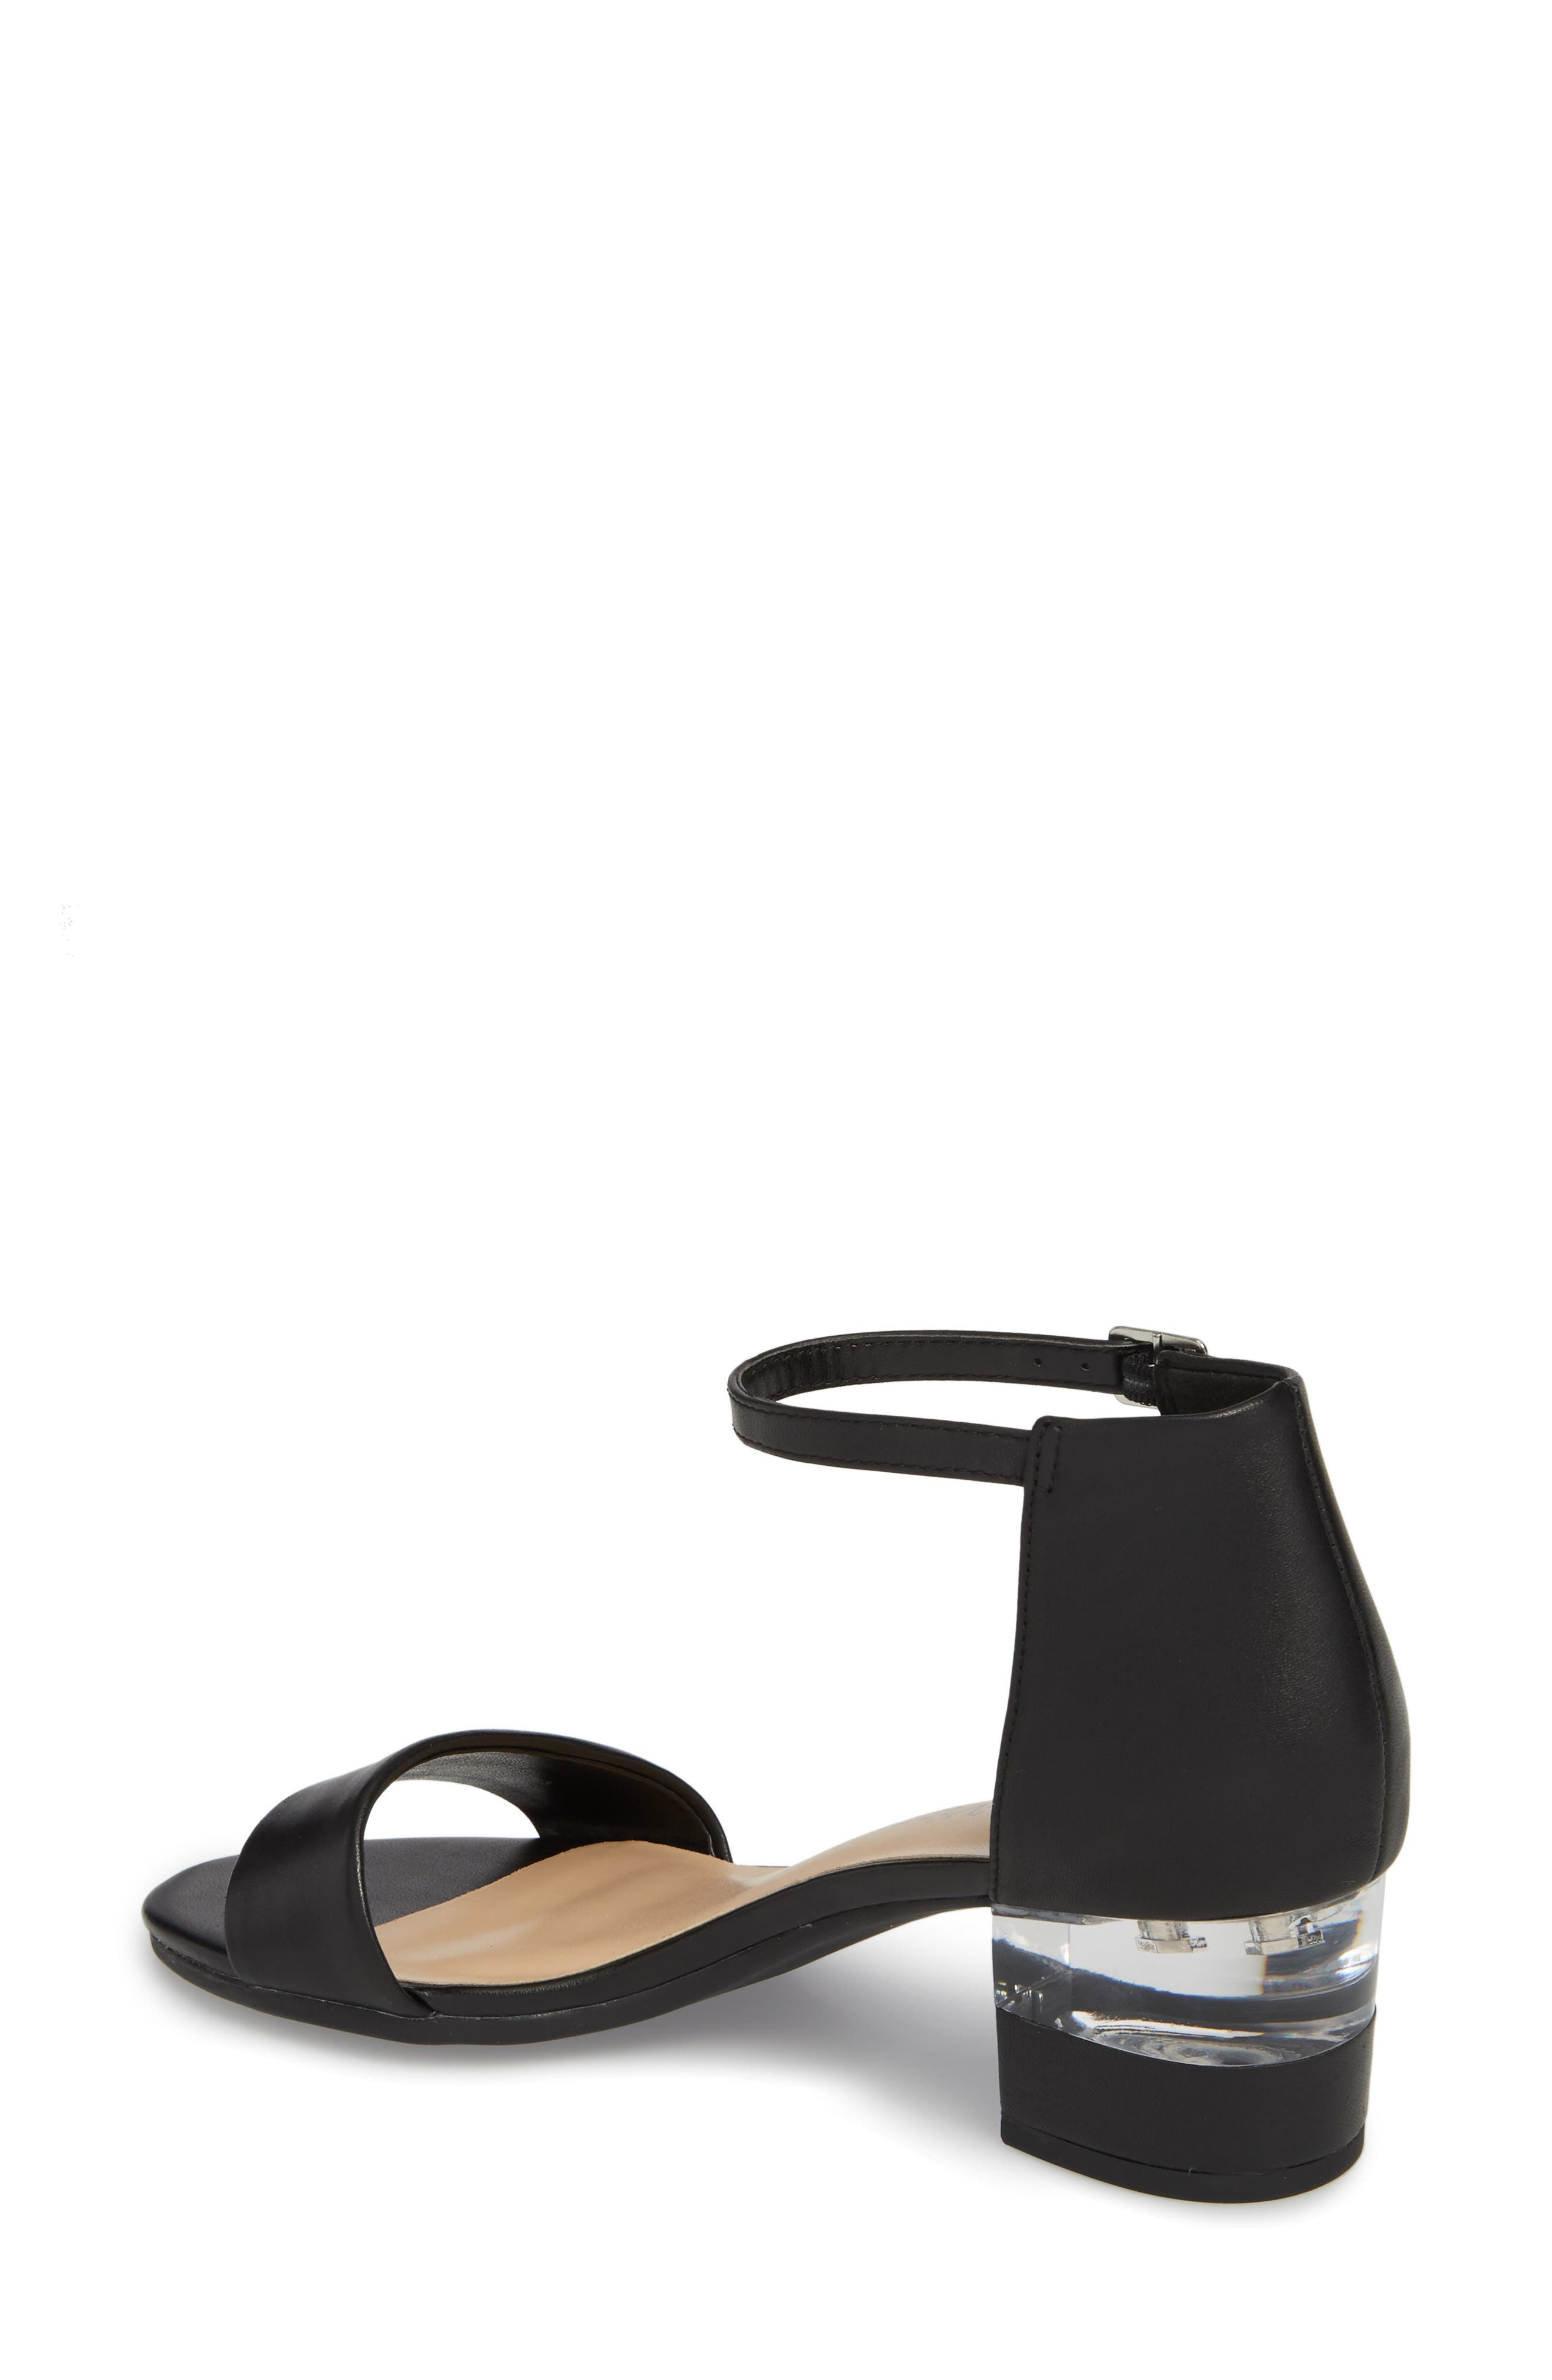 Fitz Block Heel Sandal,                             Alternate thumbnail 2, color,                             BLACK LEATHER